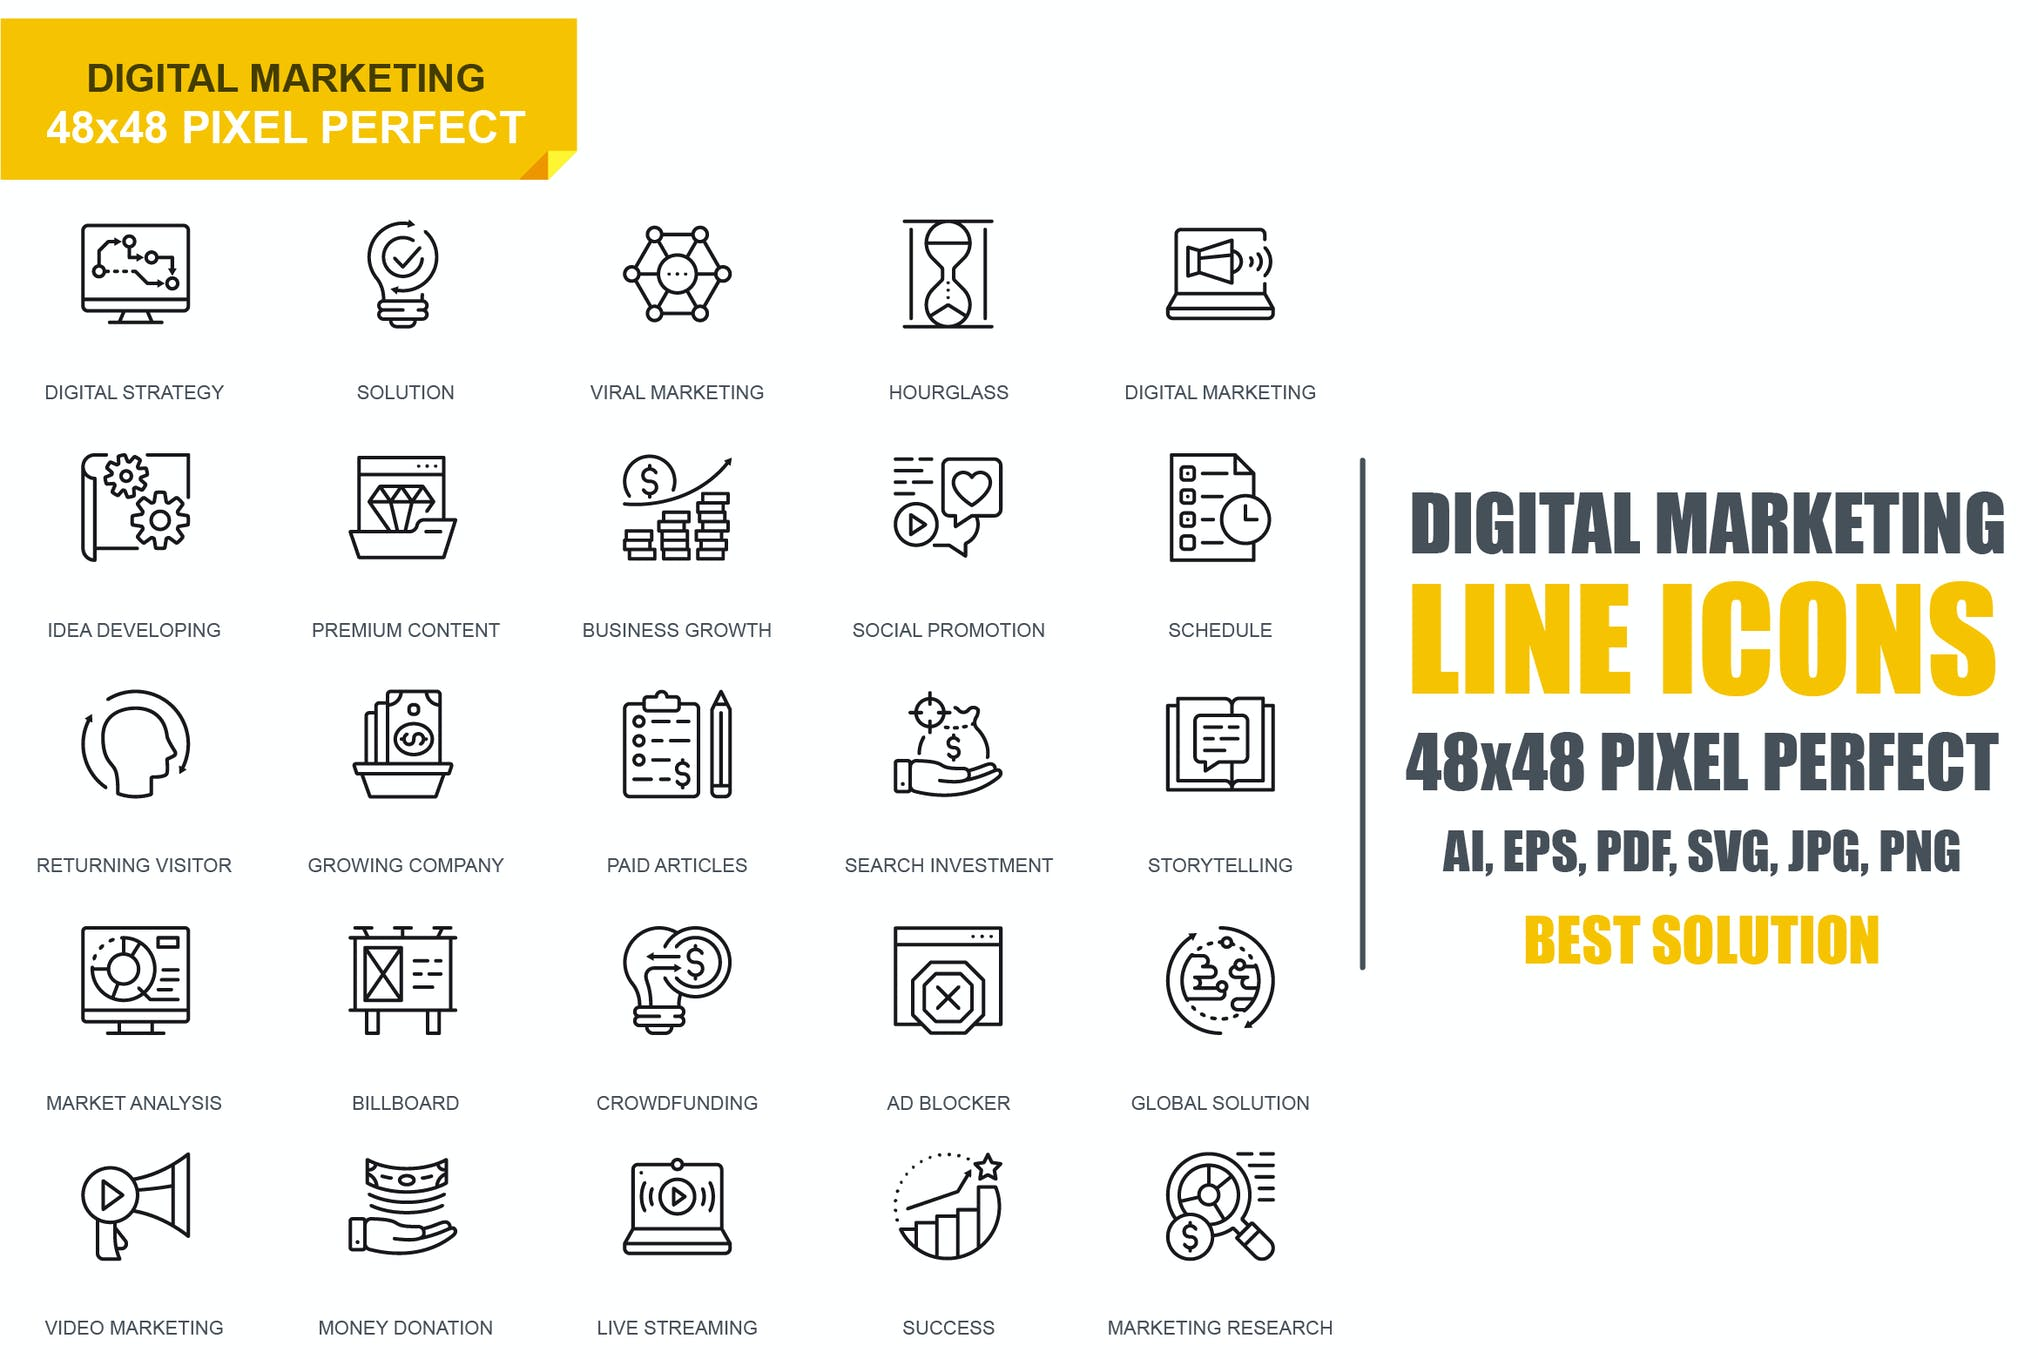 Simple Set Digital Marketing Line Icons by alexdndz on